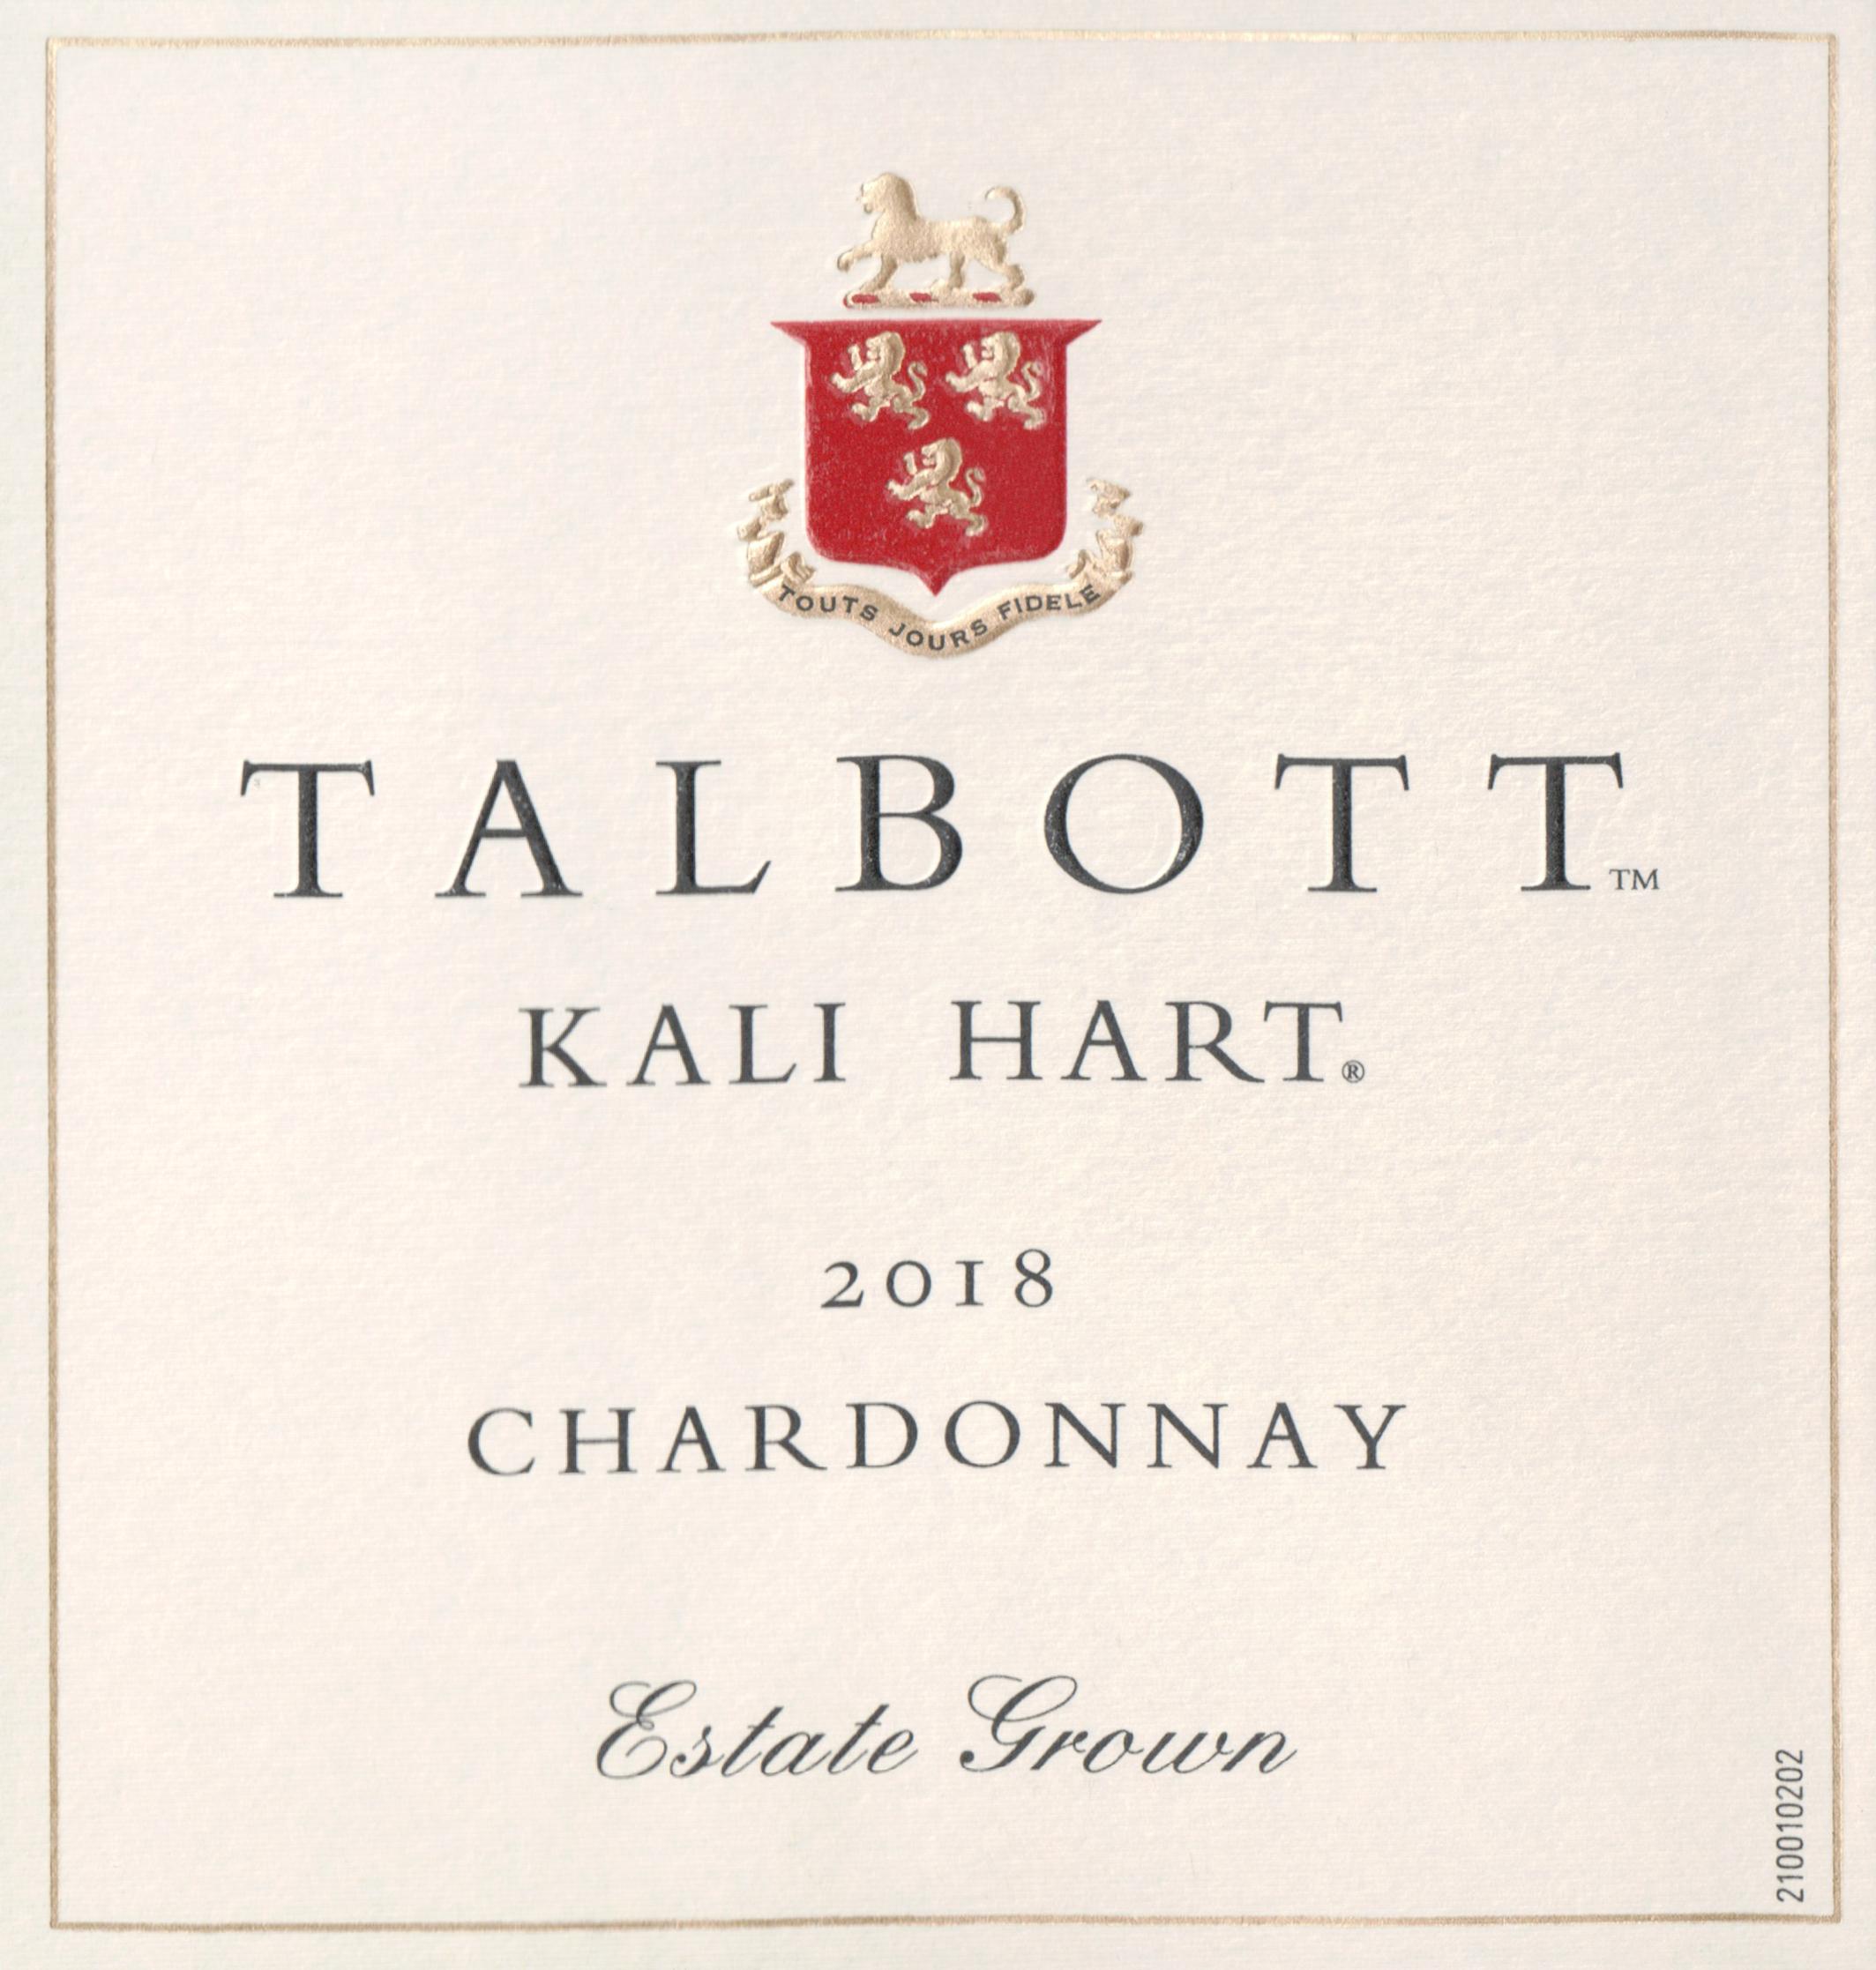 Kali Hart Chardonnay 2018